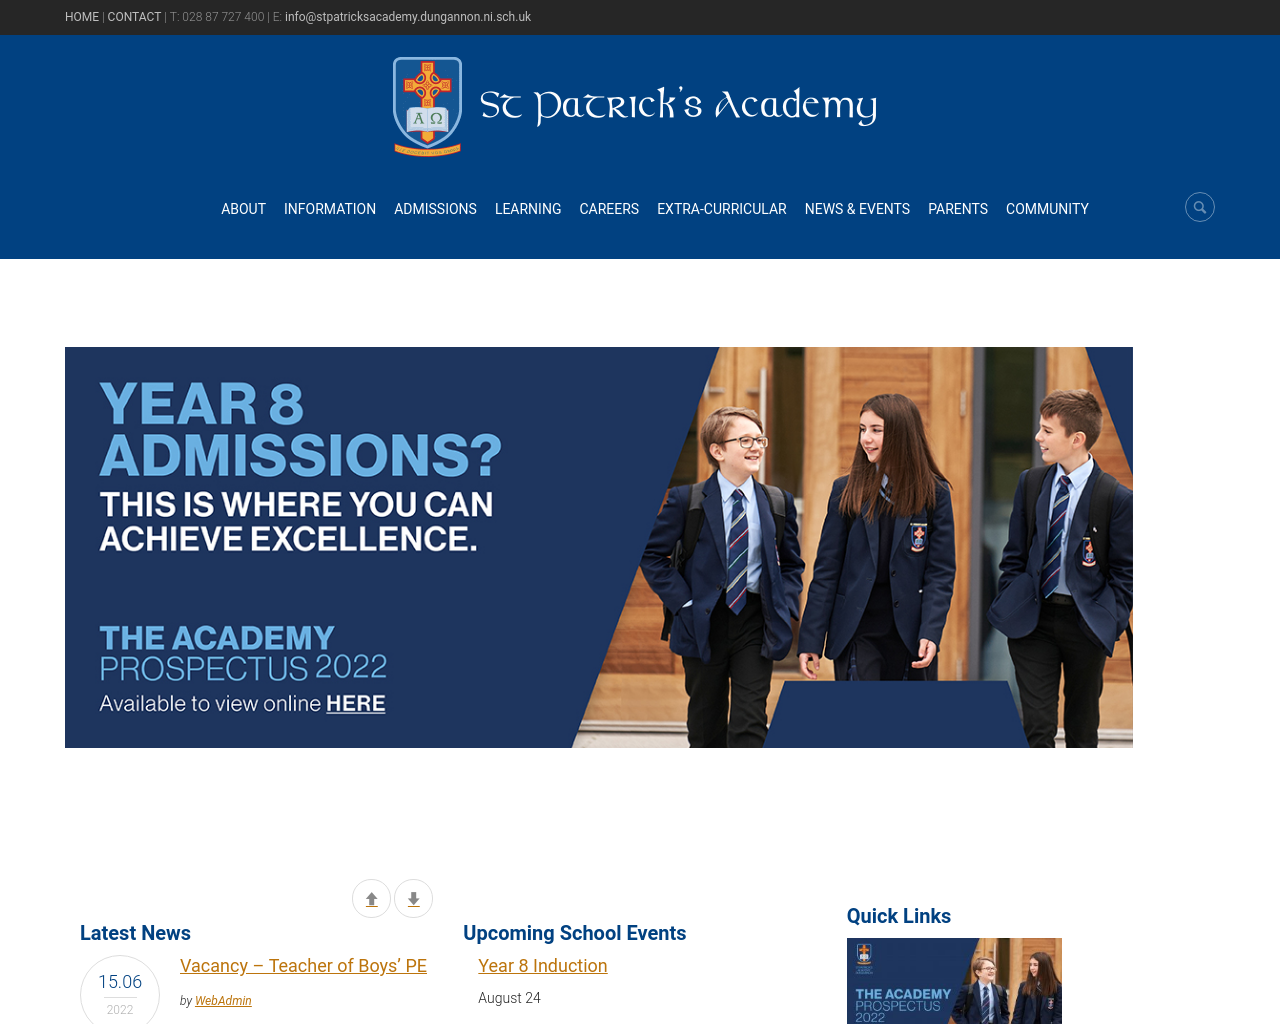 St Patrick's Academy Dungannon